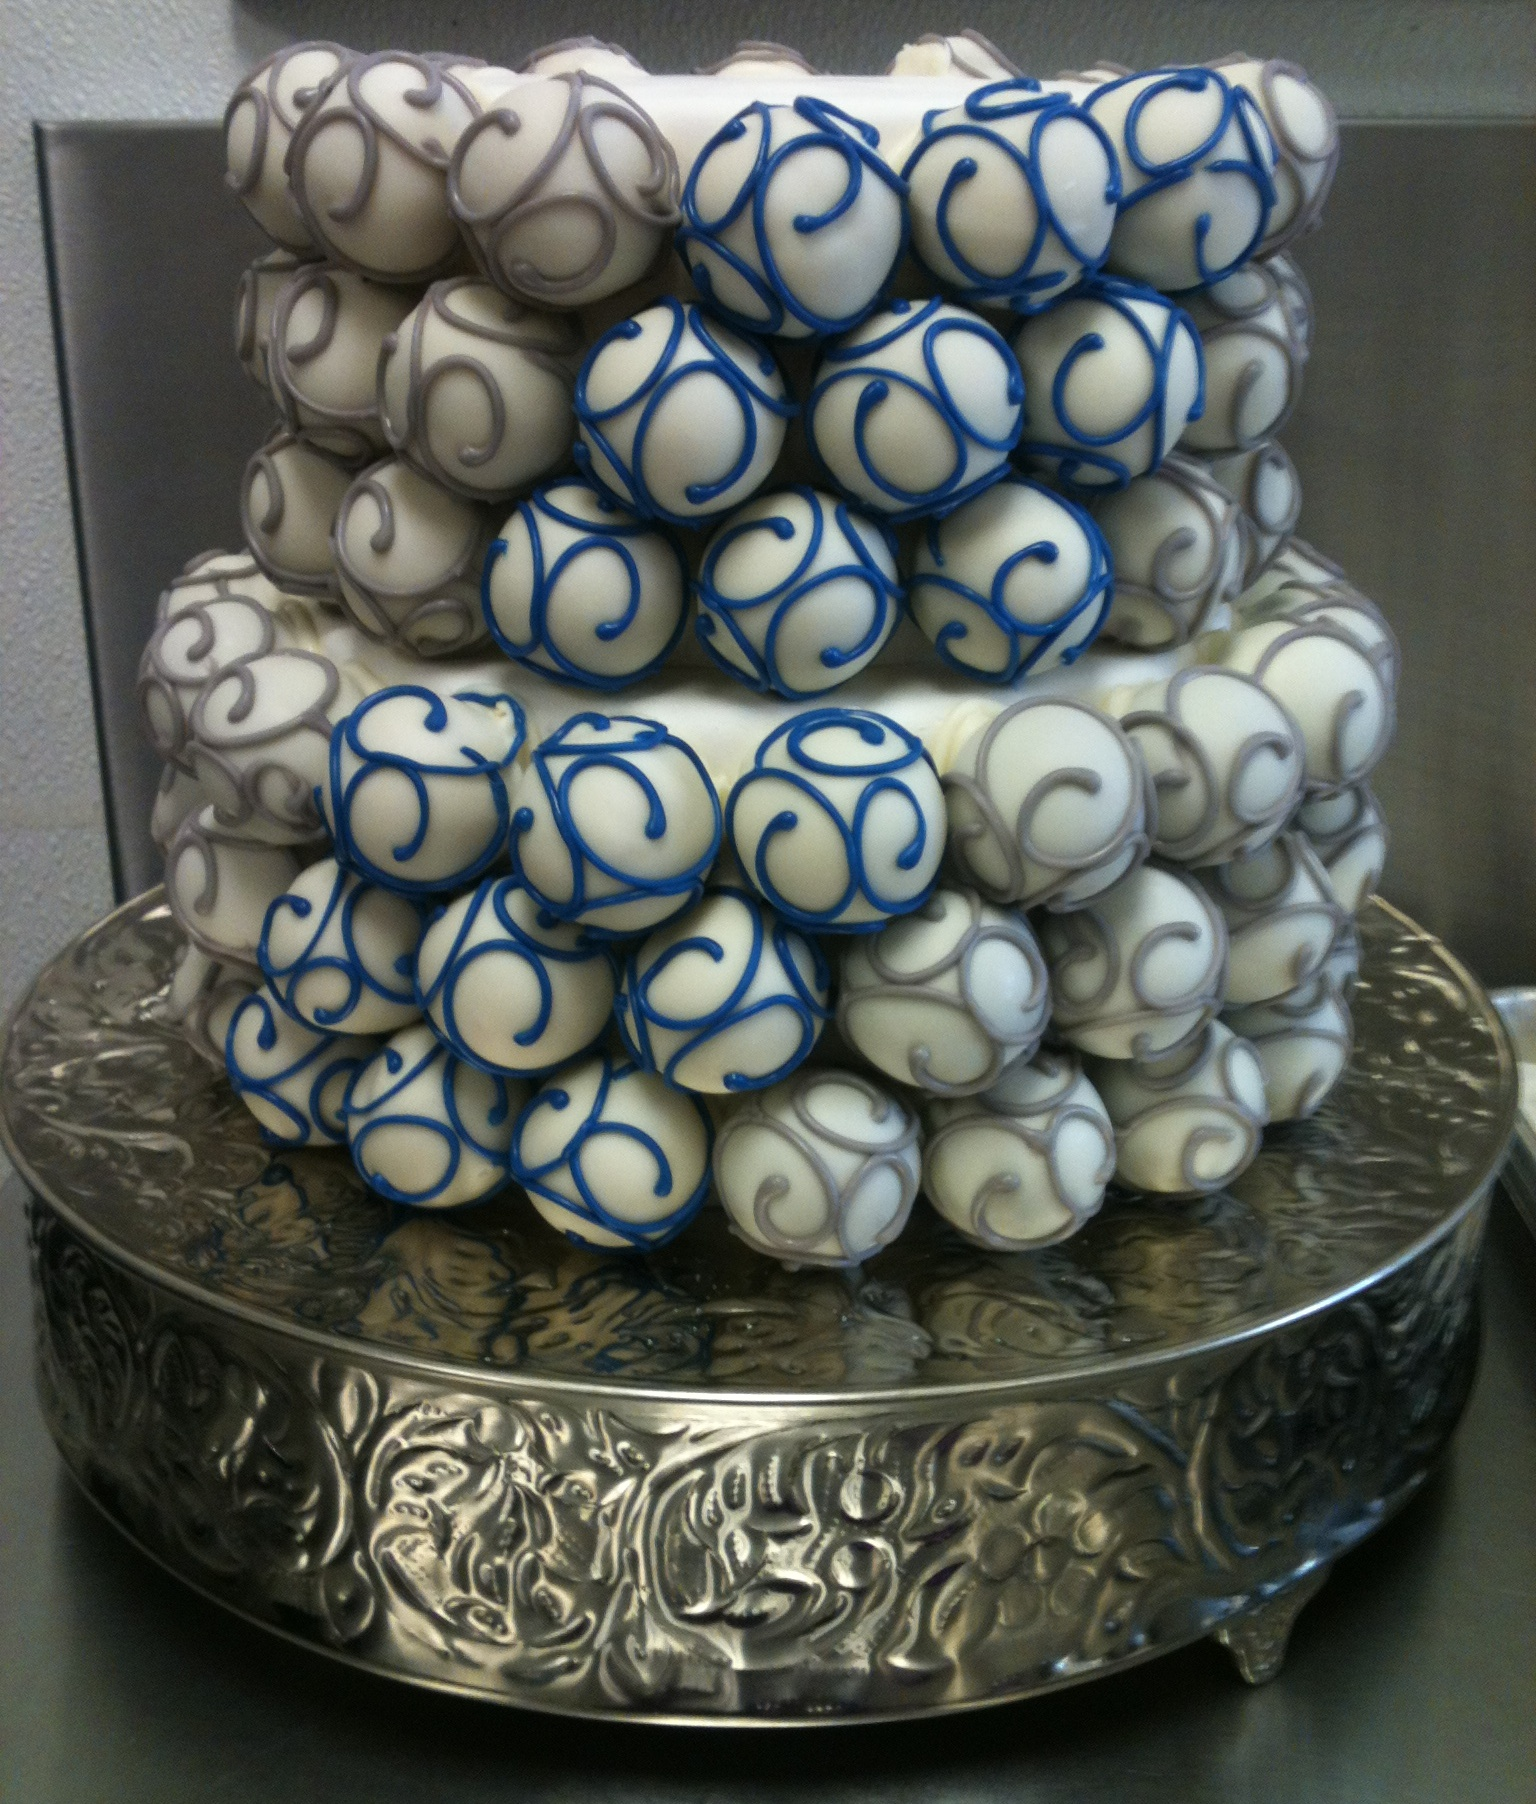 grey-and-blue-cake-ball-cake.jpg